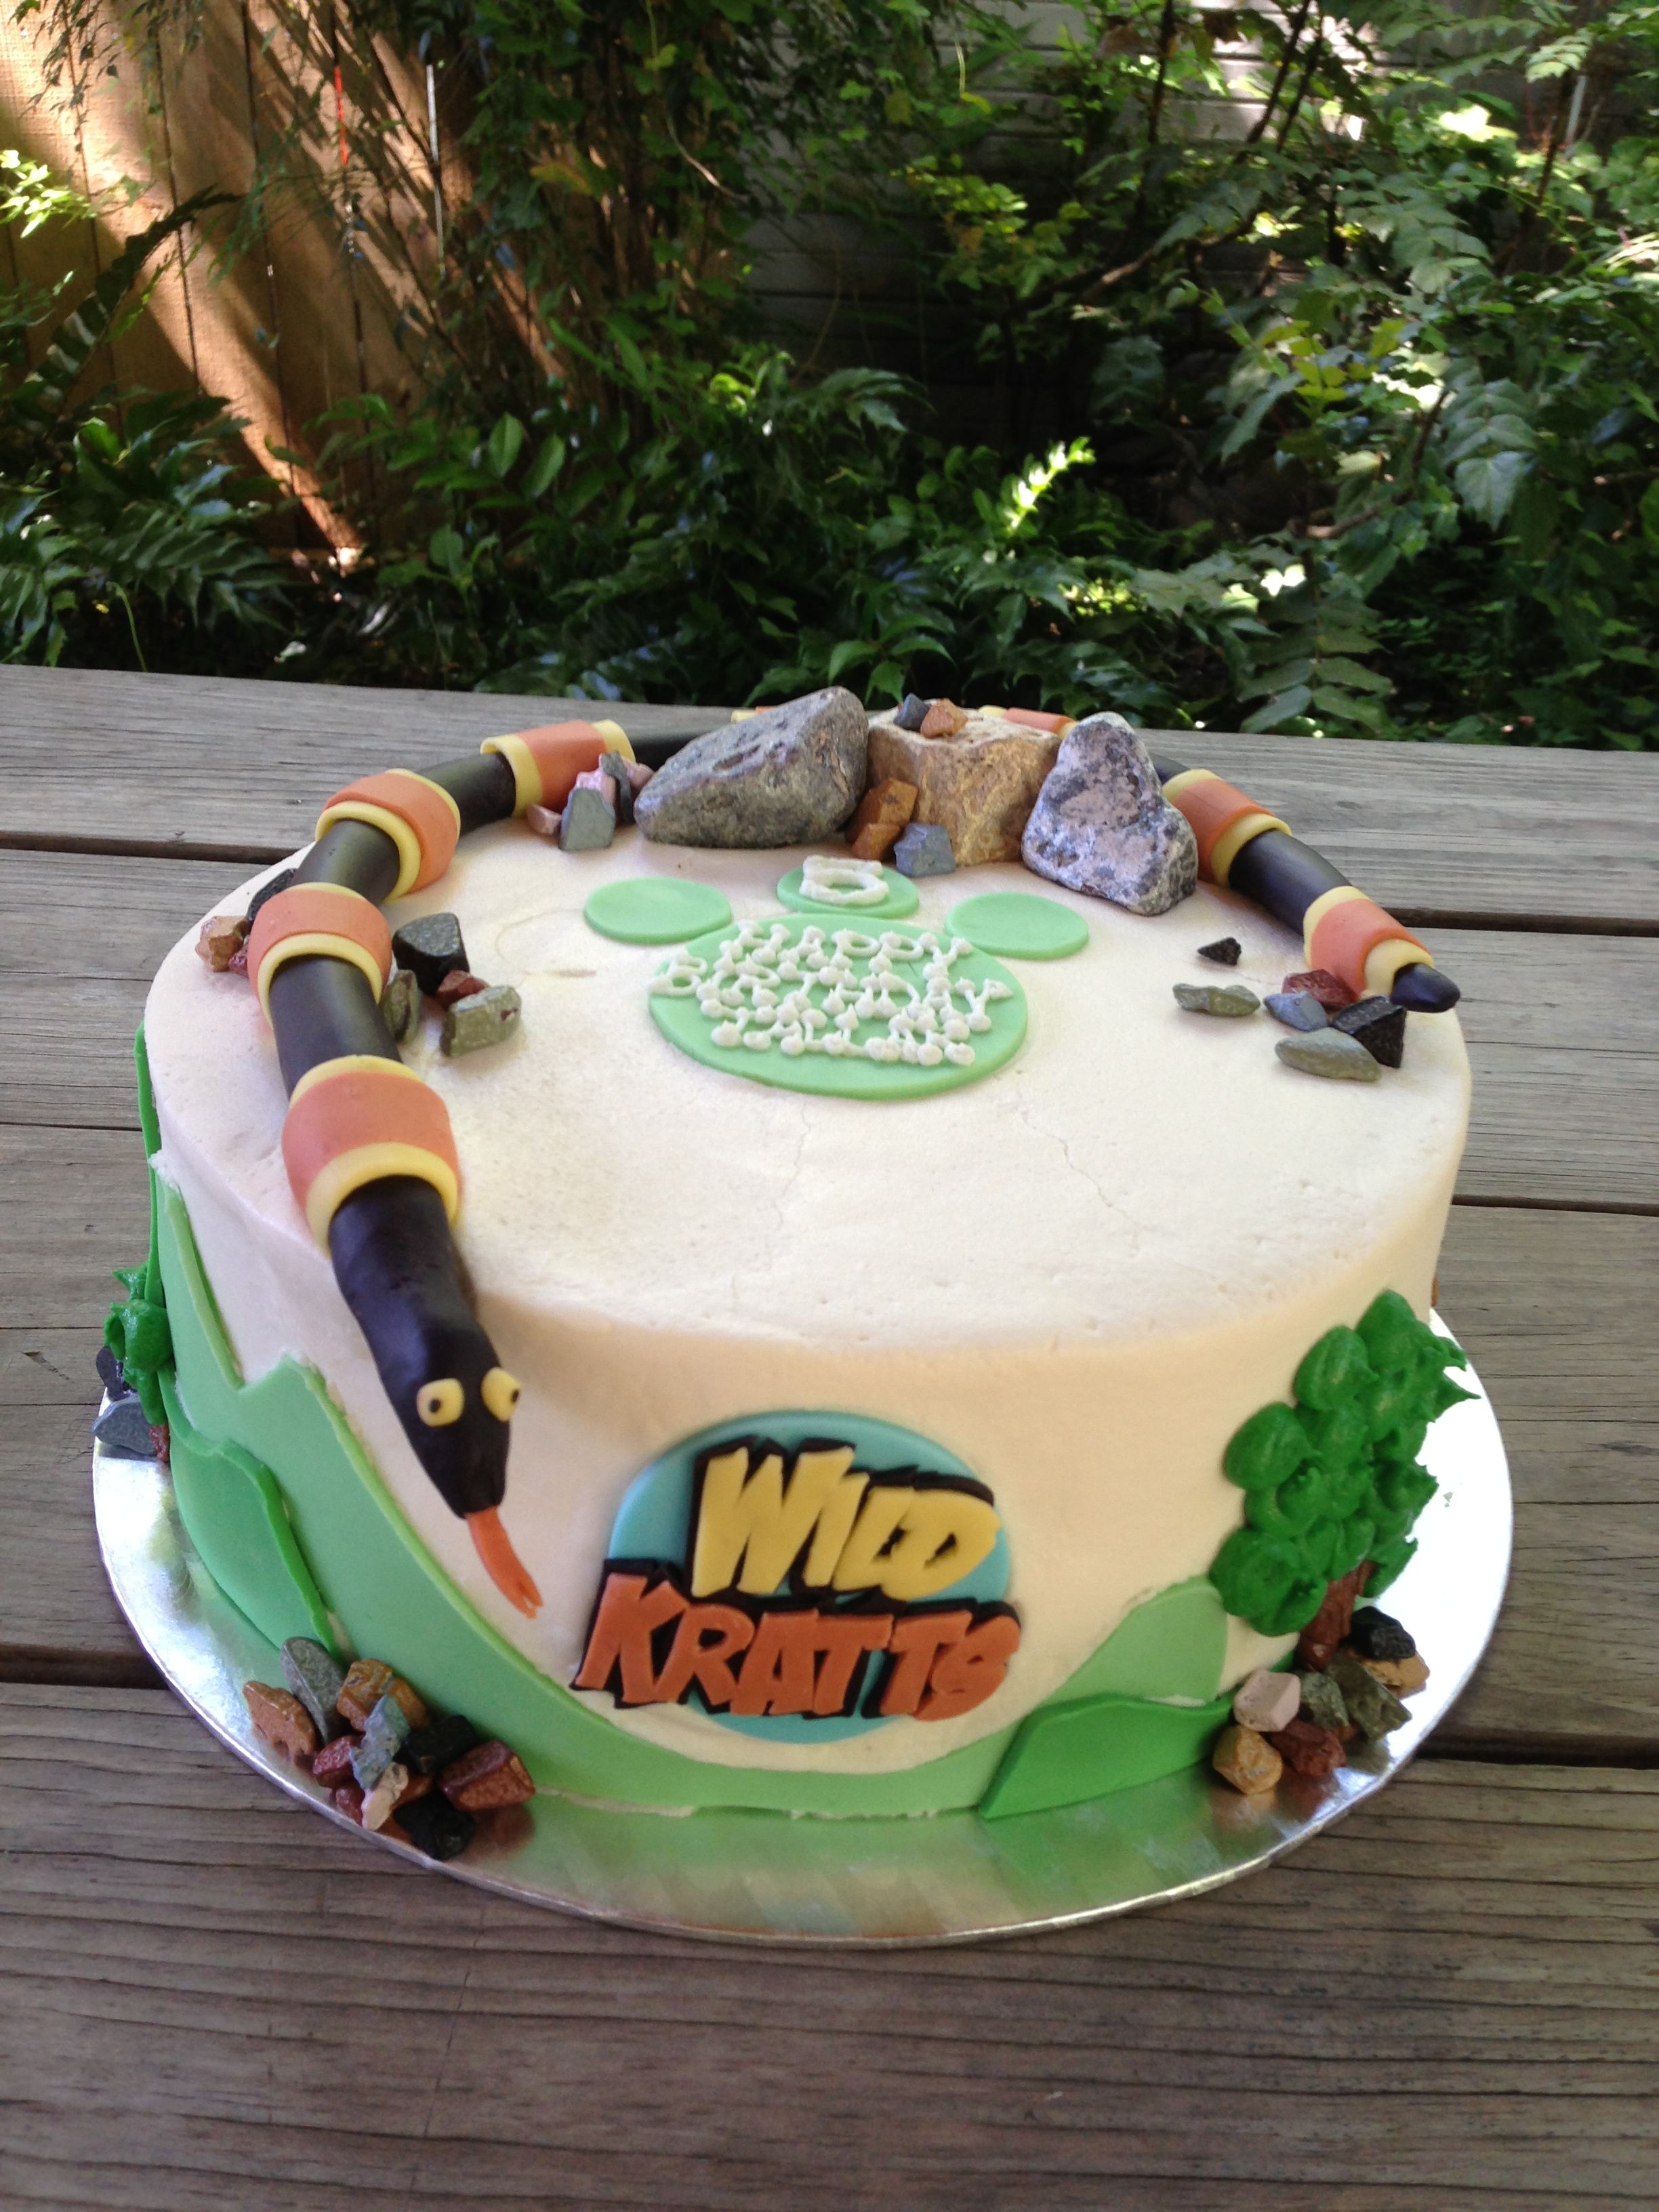 Wild Kratts Cake By Laura Louis Houston Tx